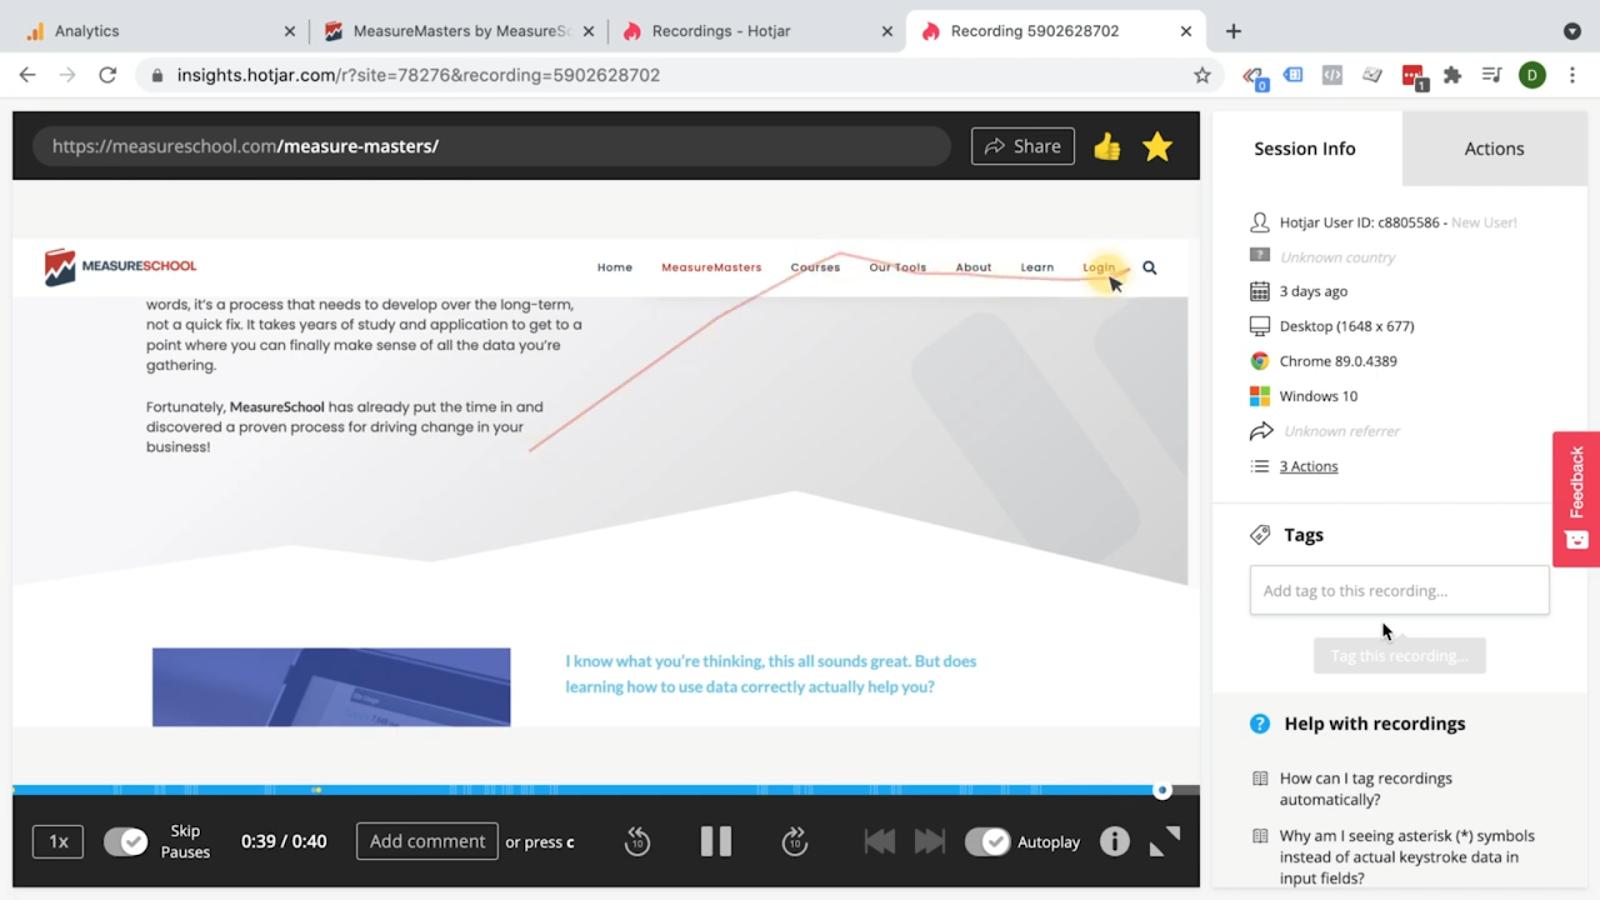 Hotjar - User recording - user leaving the website